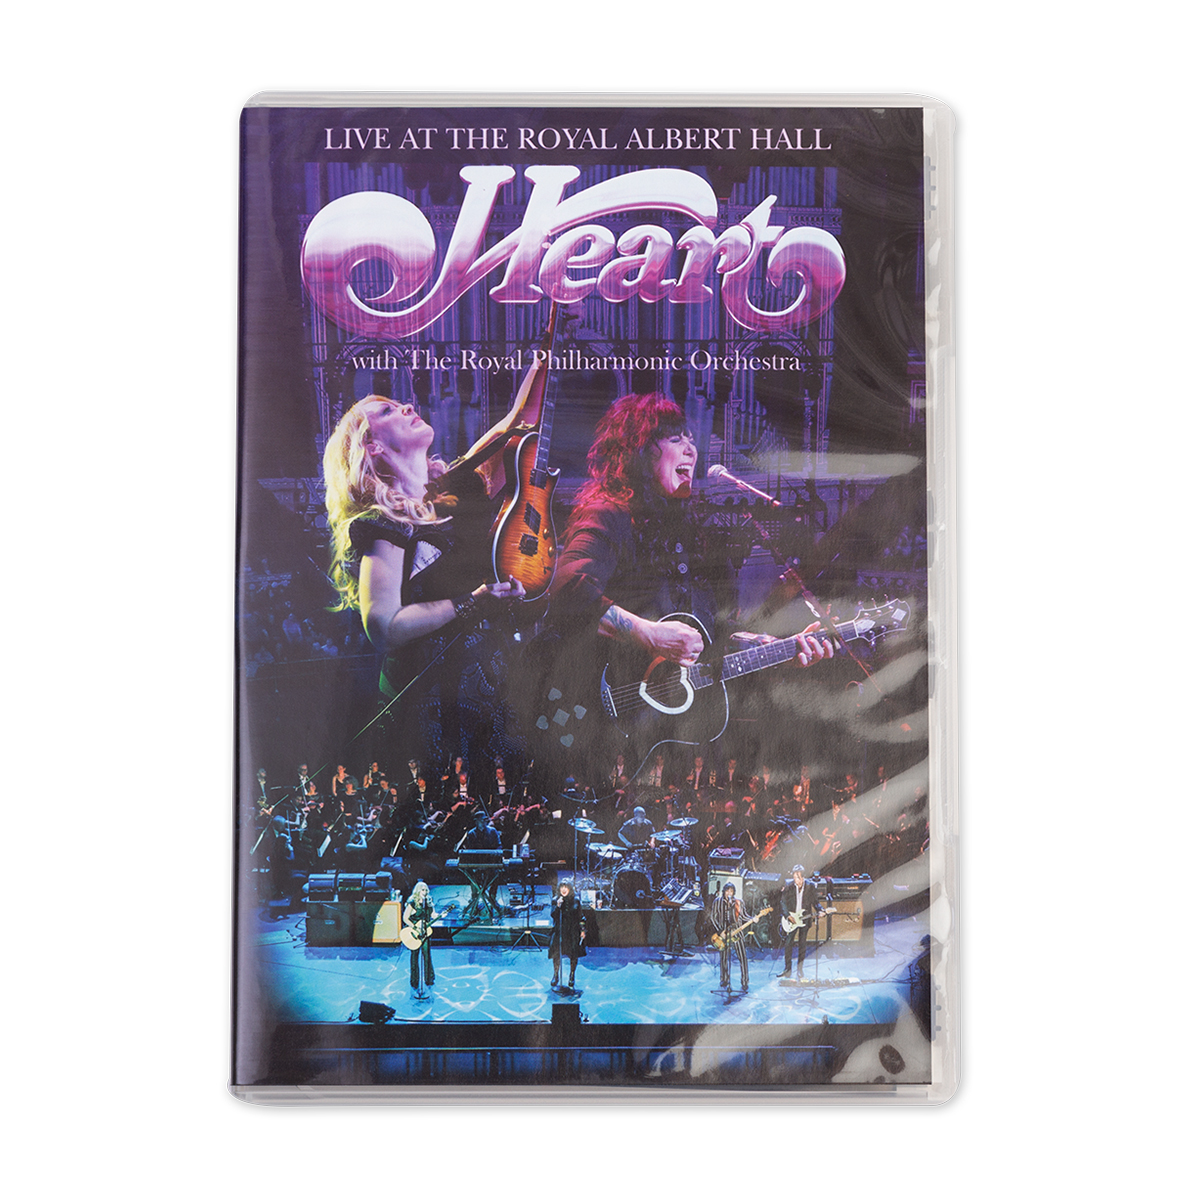 Live At The Royal Albert Hall DVD